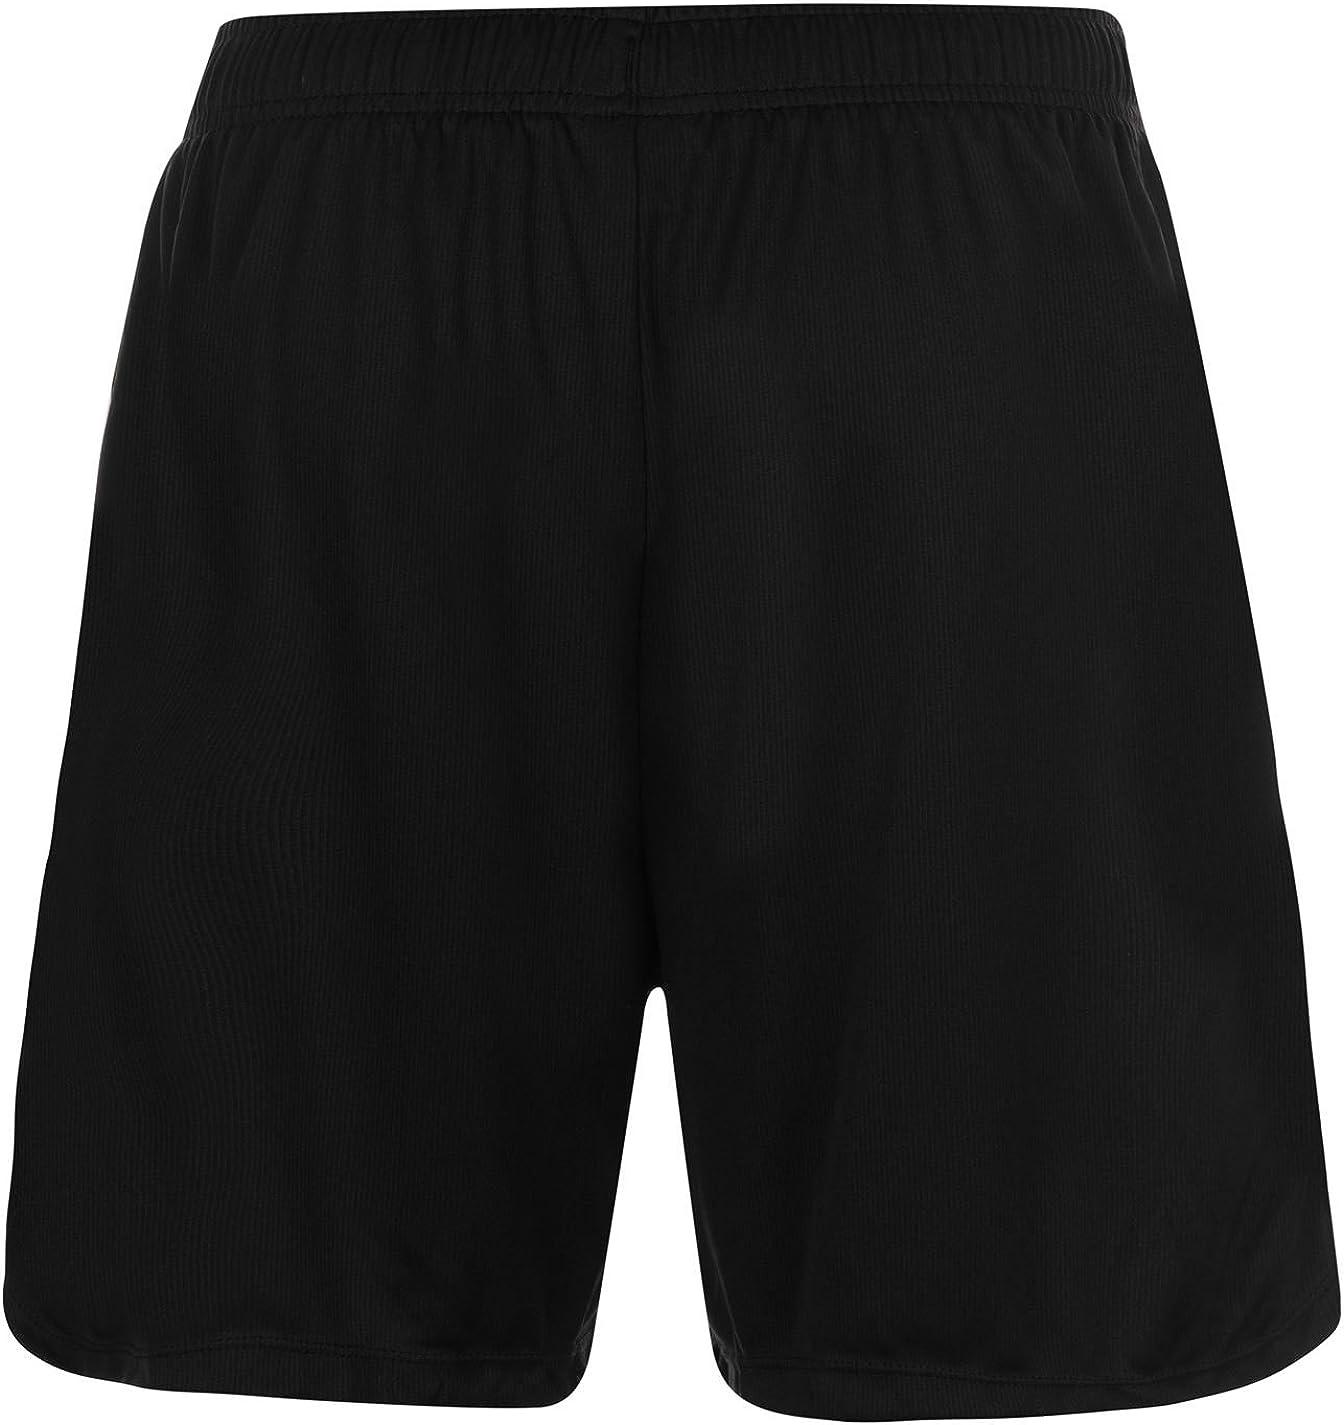 Sondico Herren Core Fu/ßball Shorts